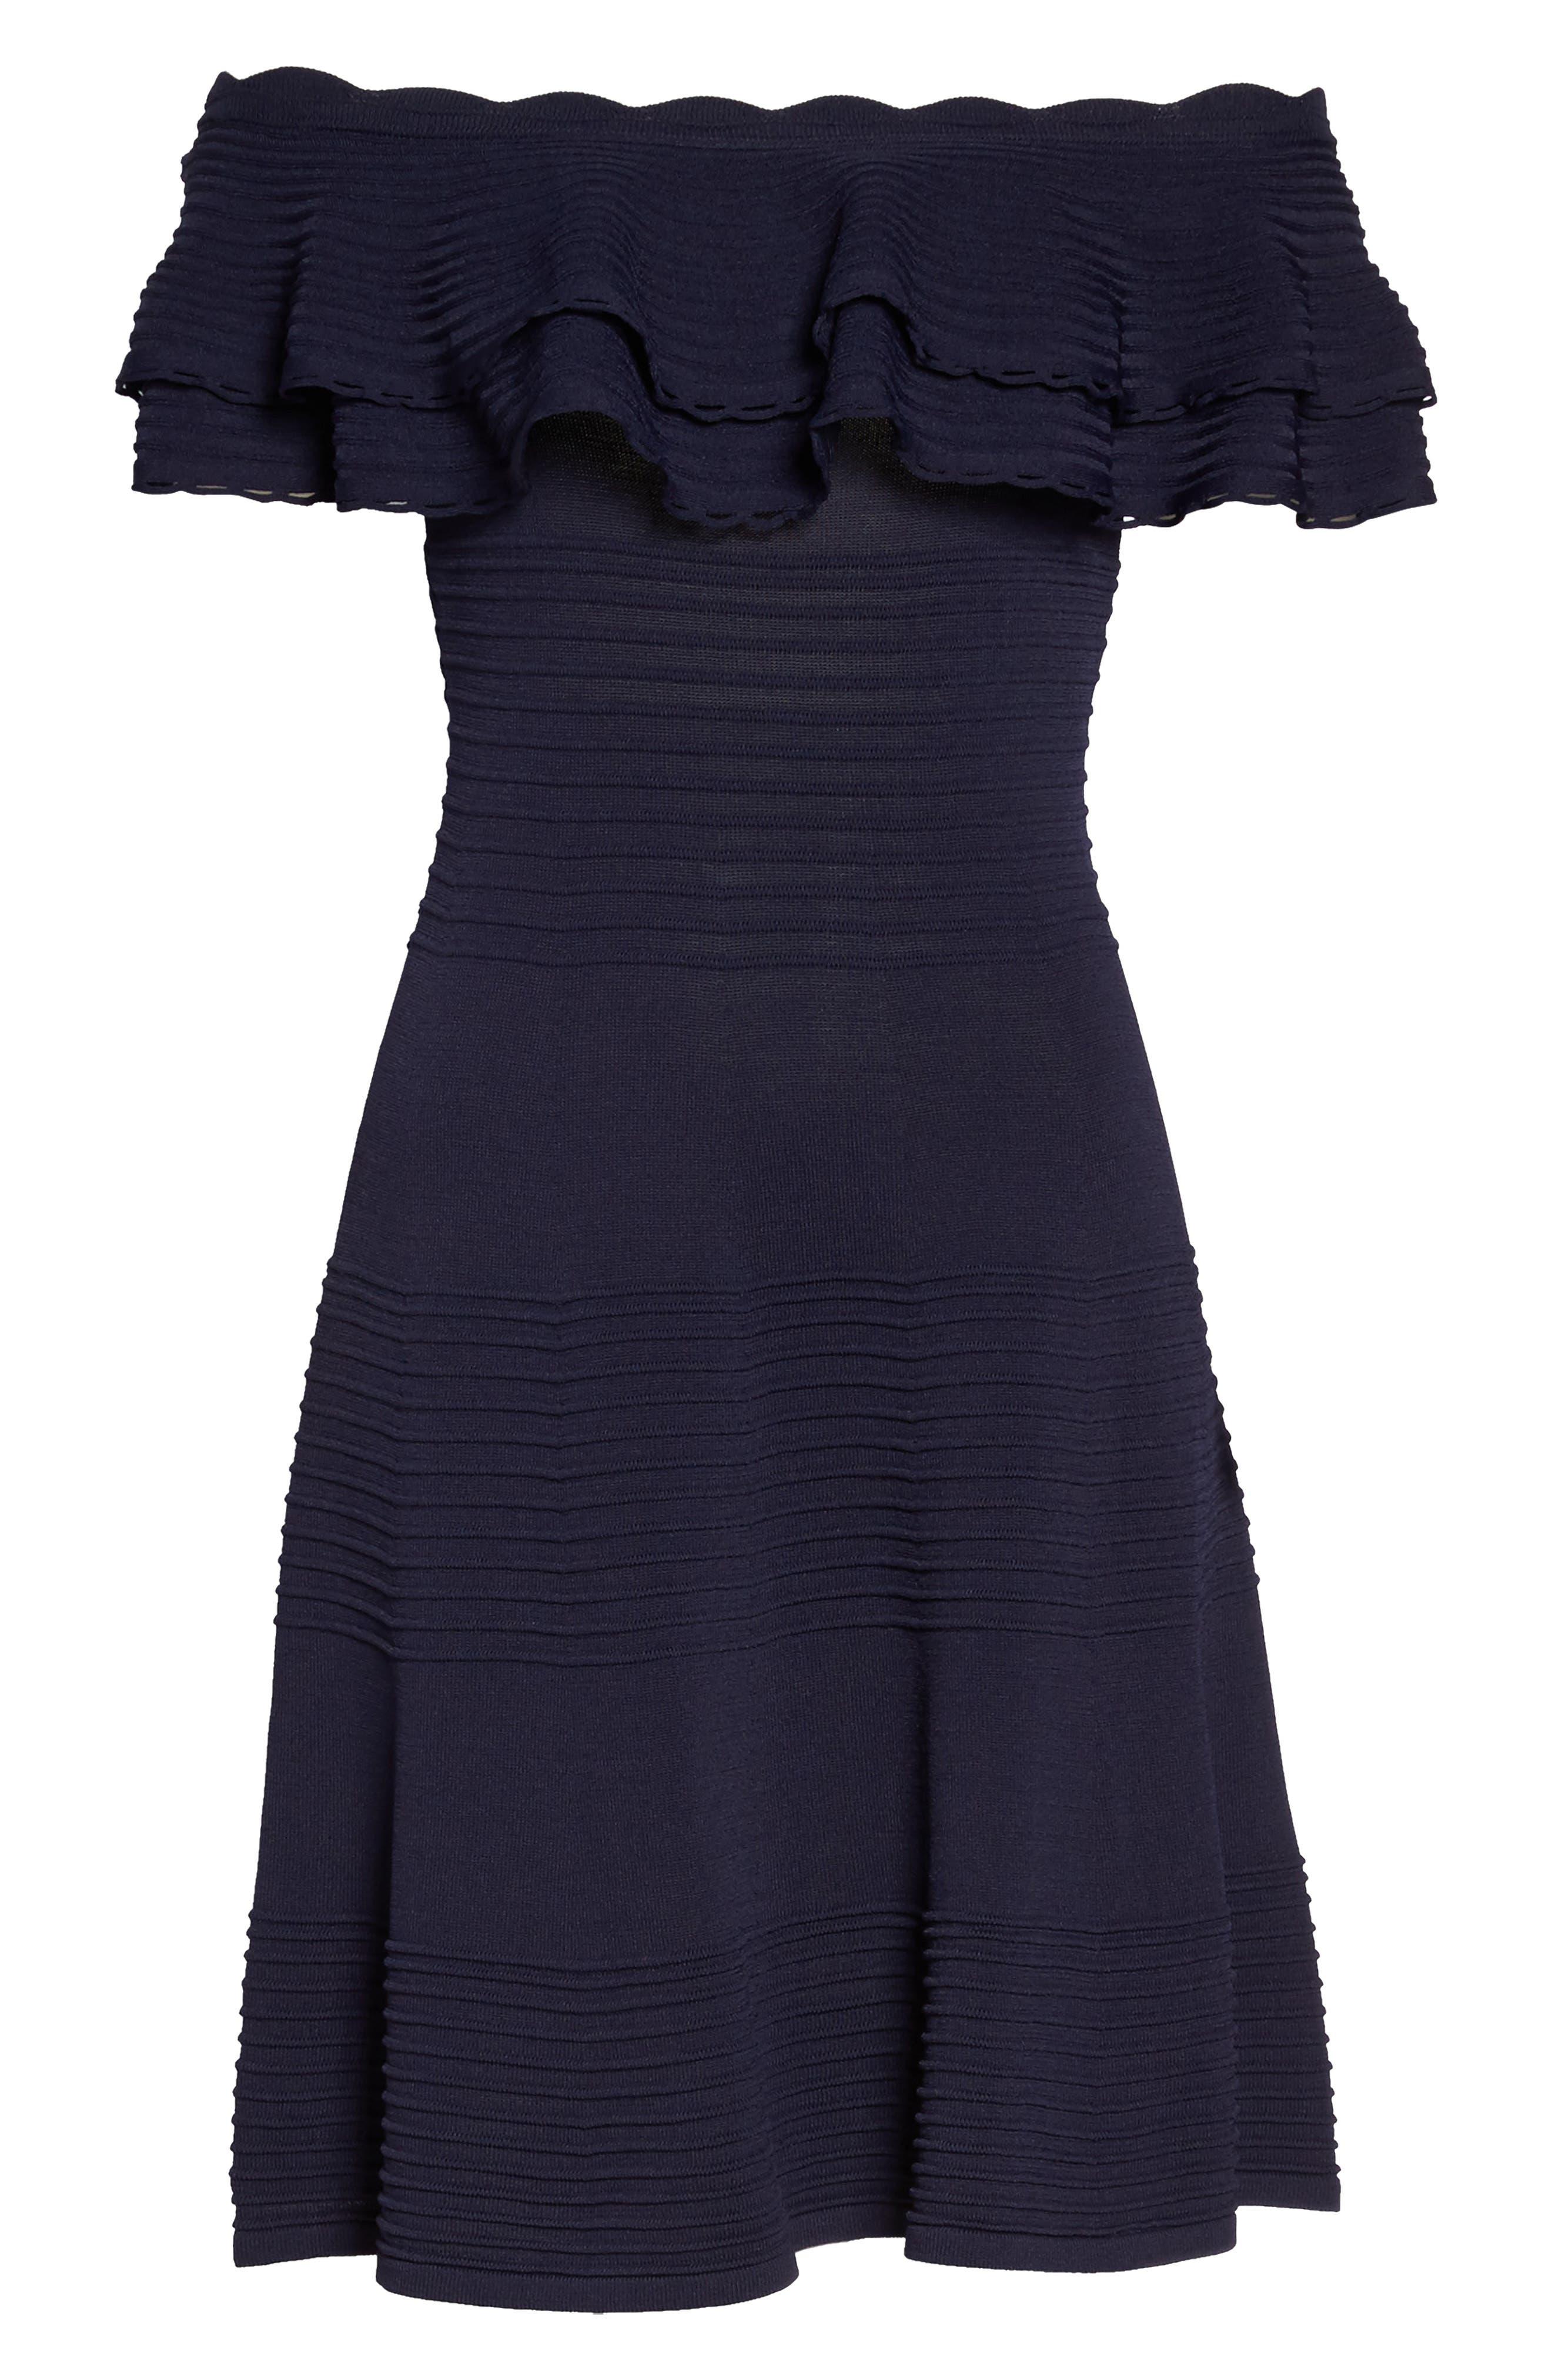 Off the Shoulder Fit & Flare Dress,                             Alternate thumbnail 7, color,                             NAVY